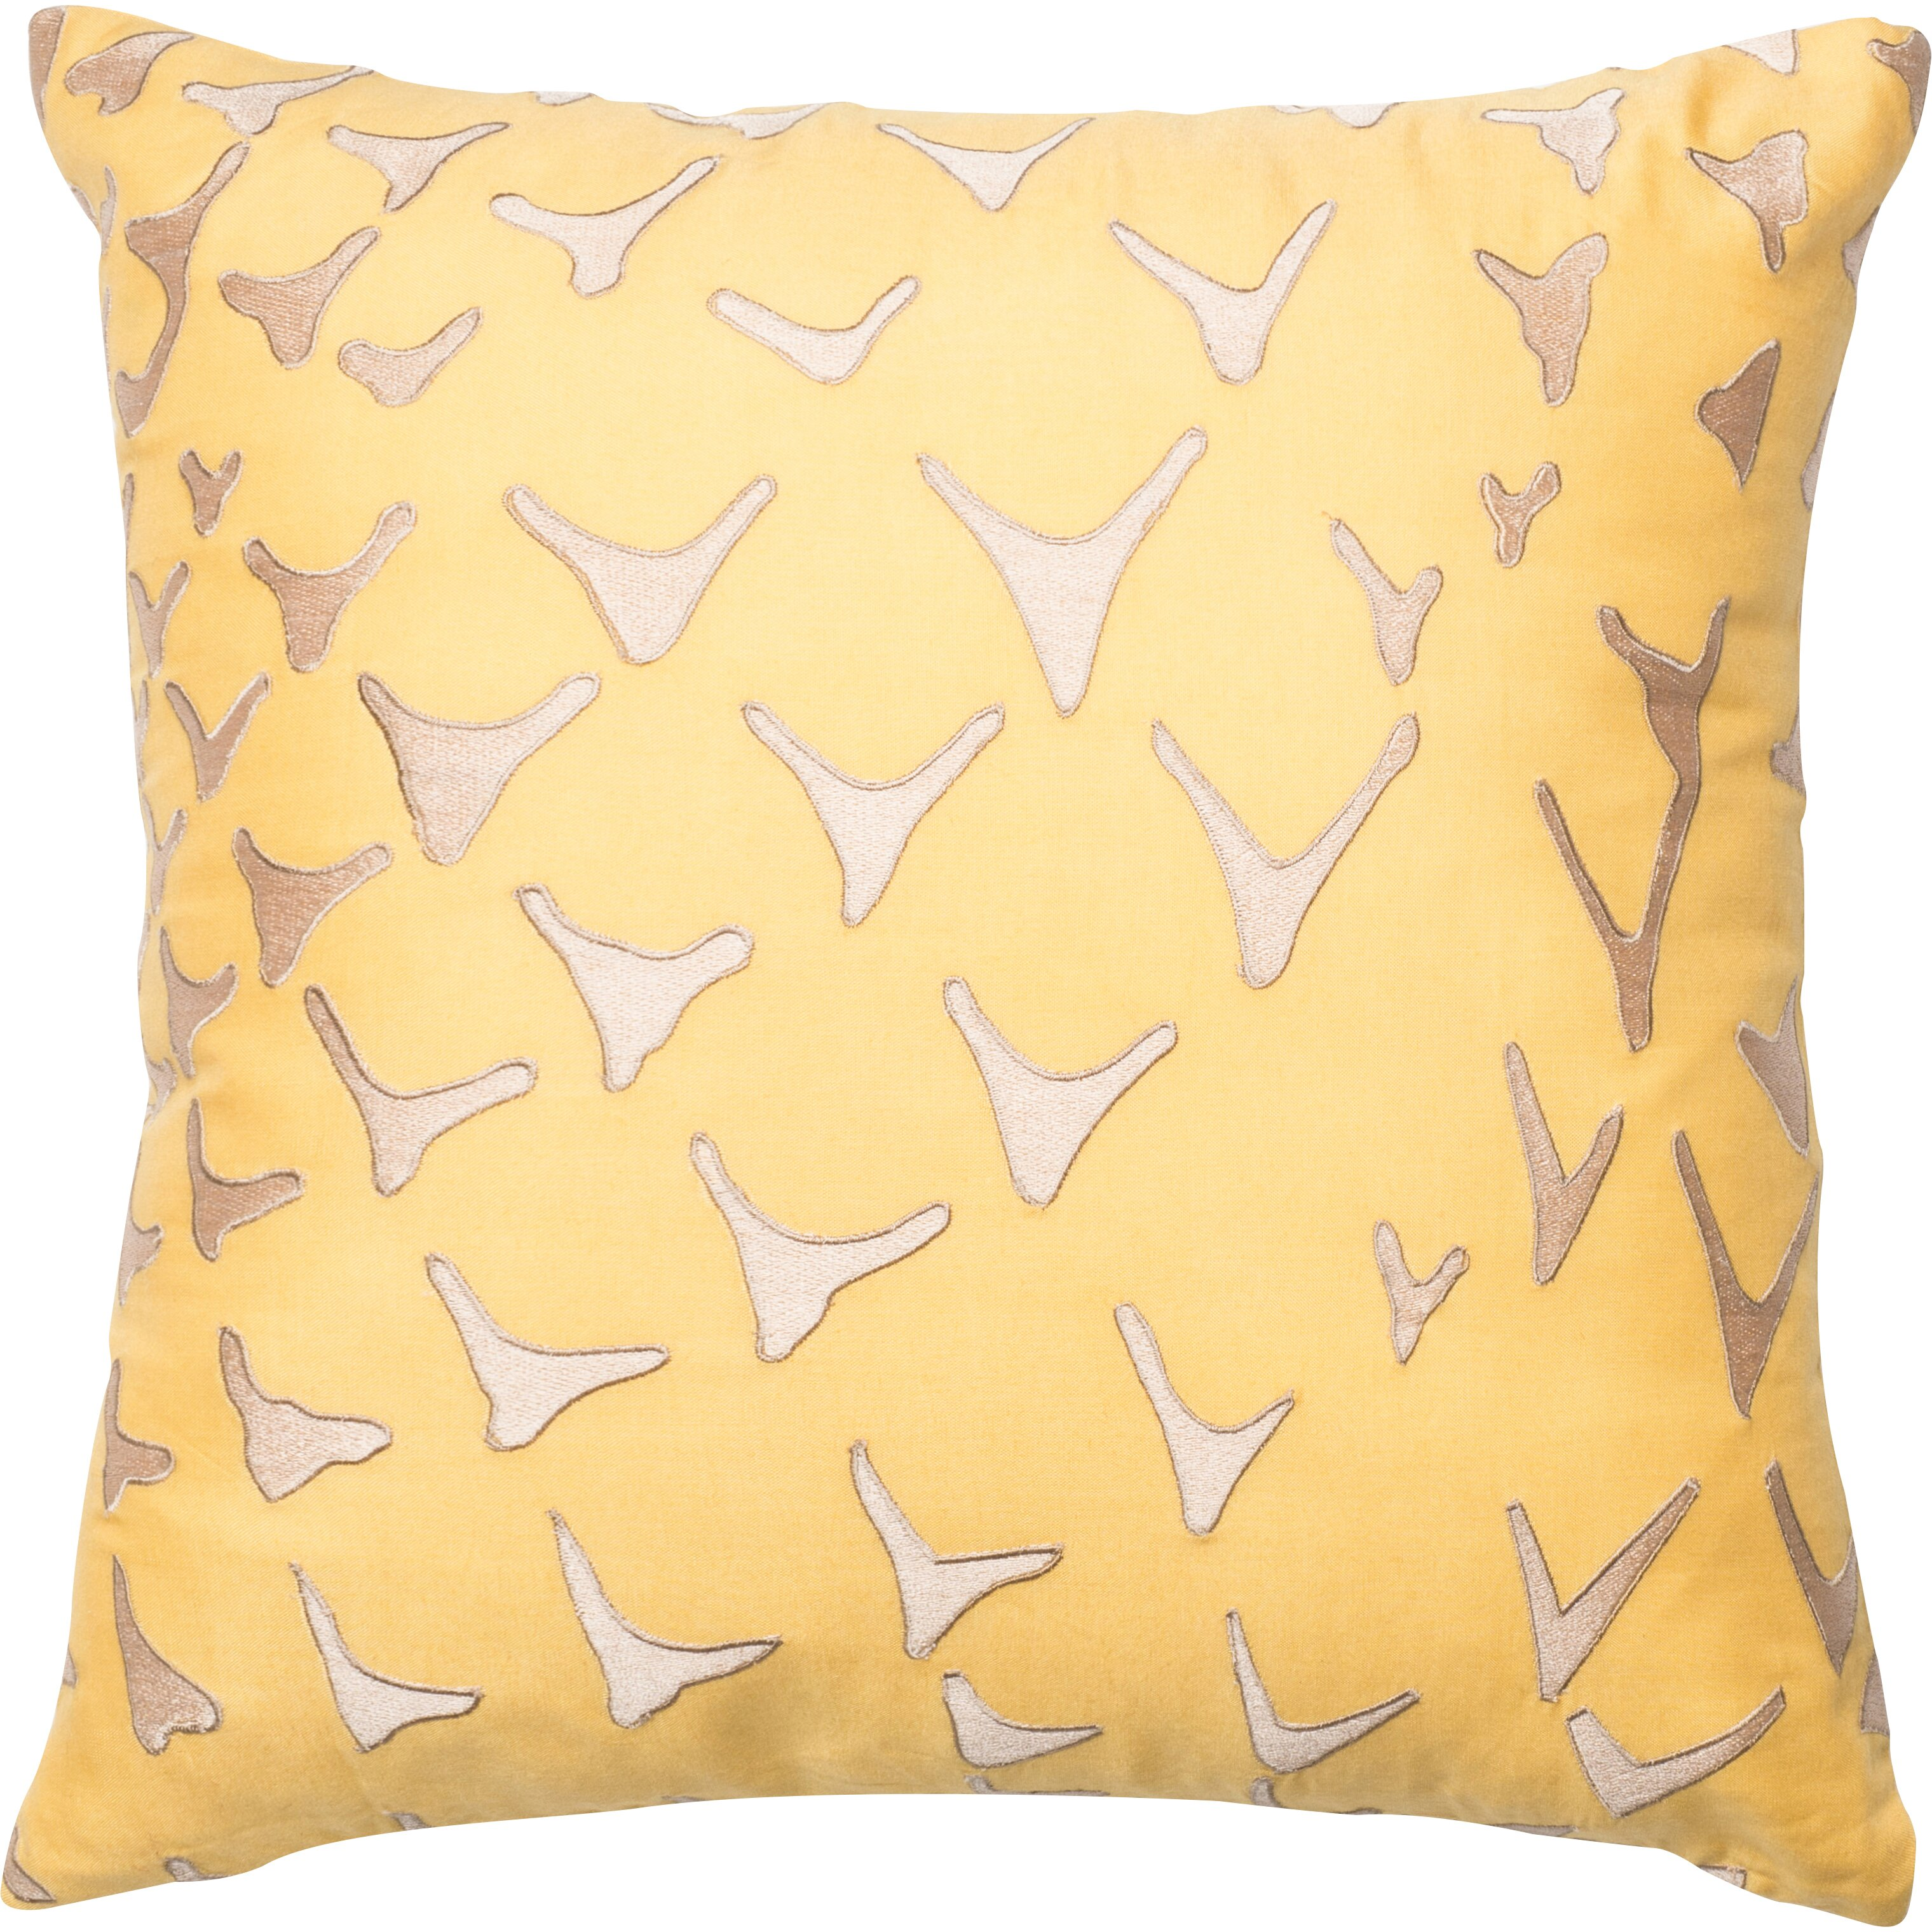 Loloi Rugs Silk Throw Pillow & Reviews Wayfair